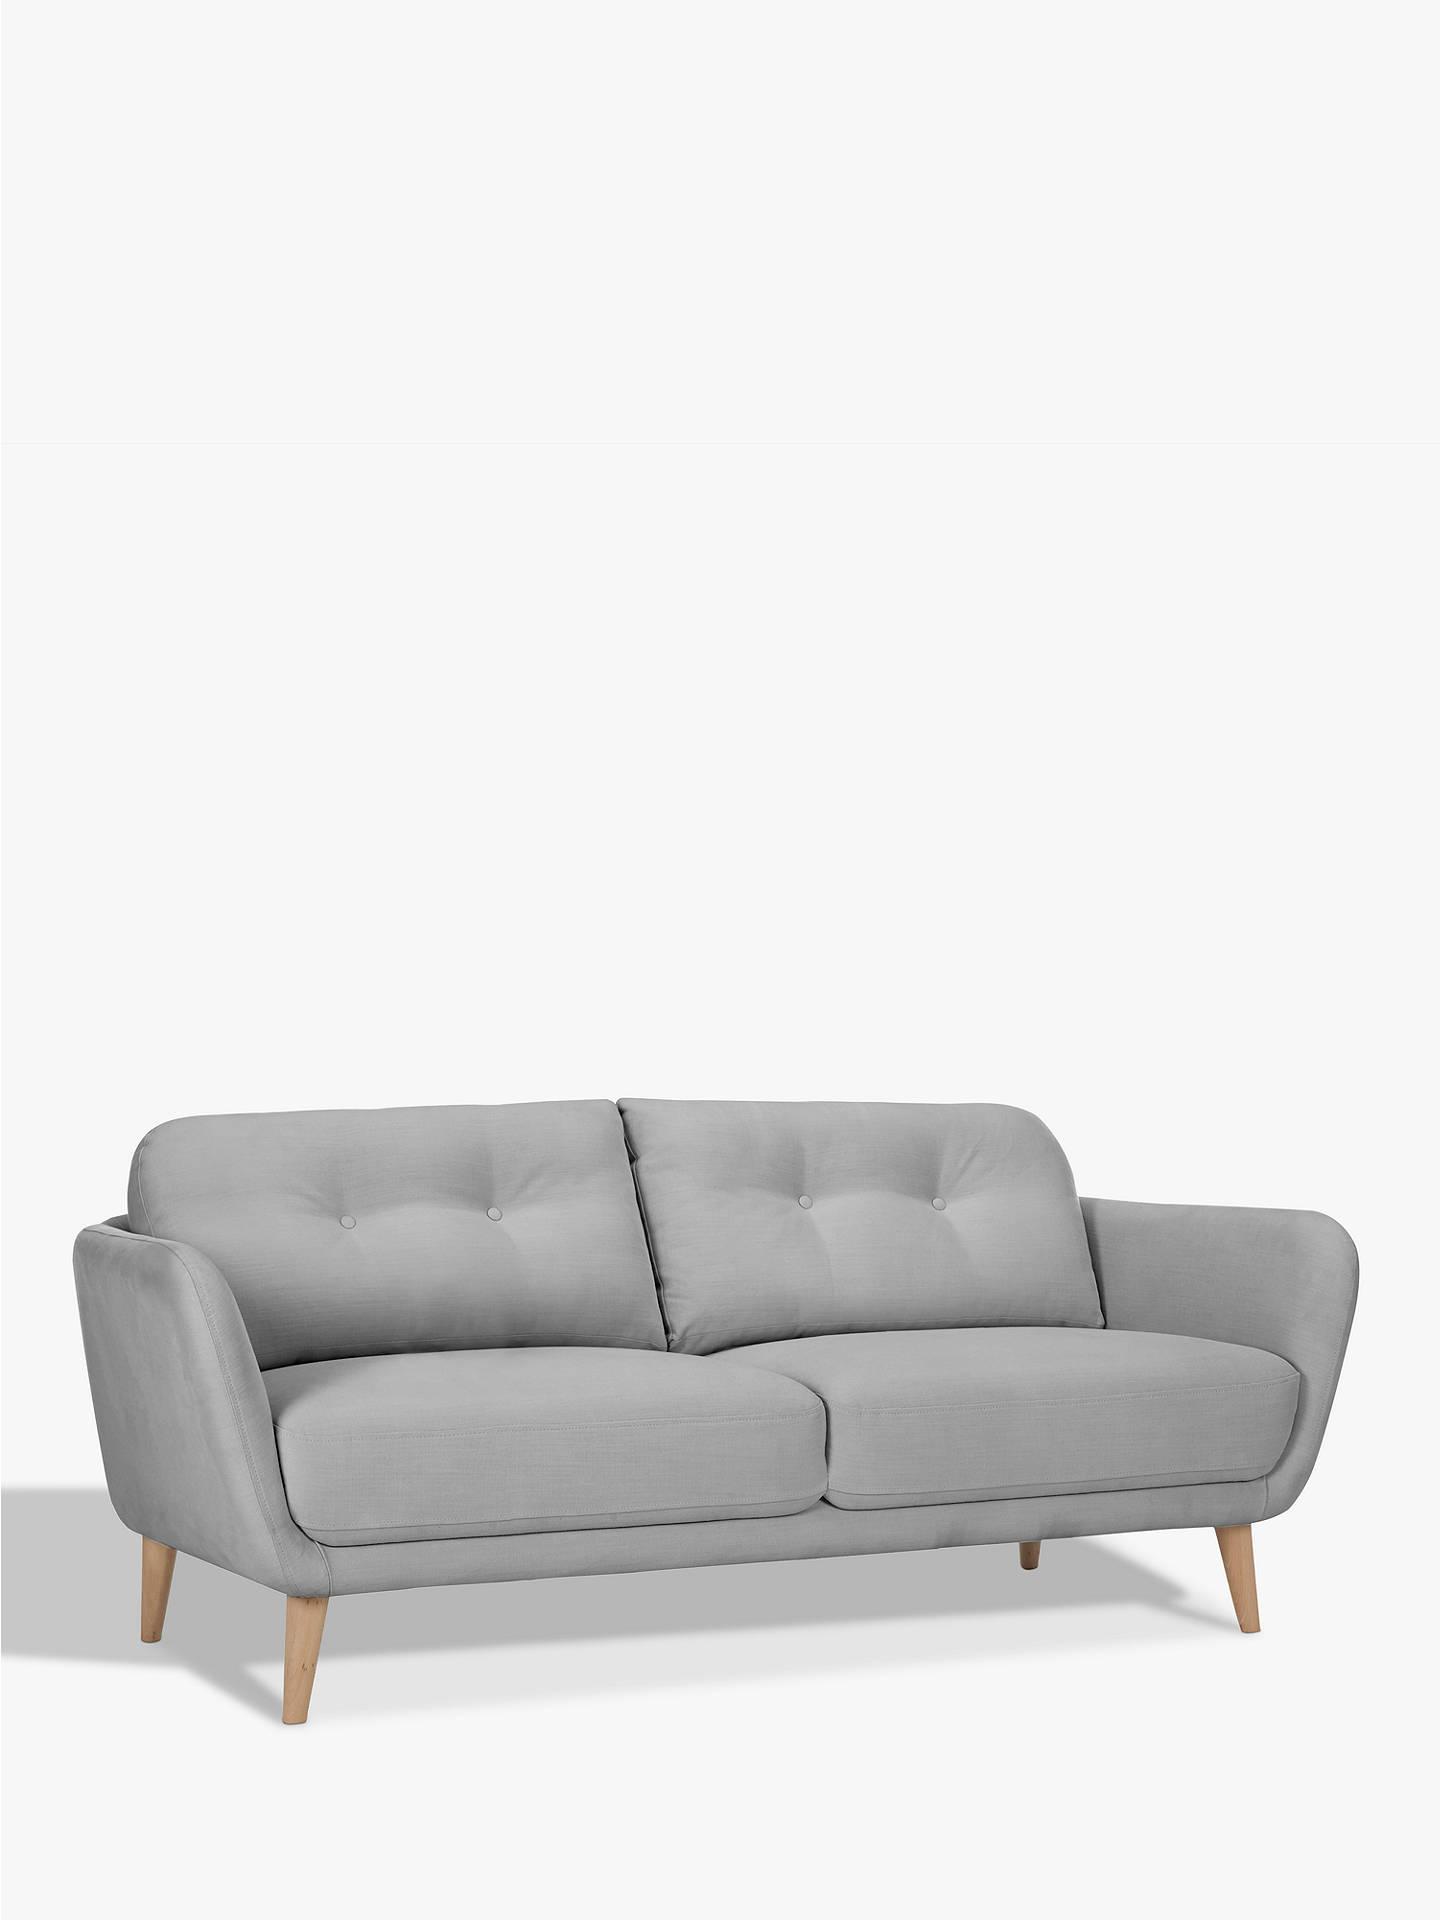 House by John Lewis Arlo Medium 2 Seater Sofa at John Lewis & Partners